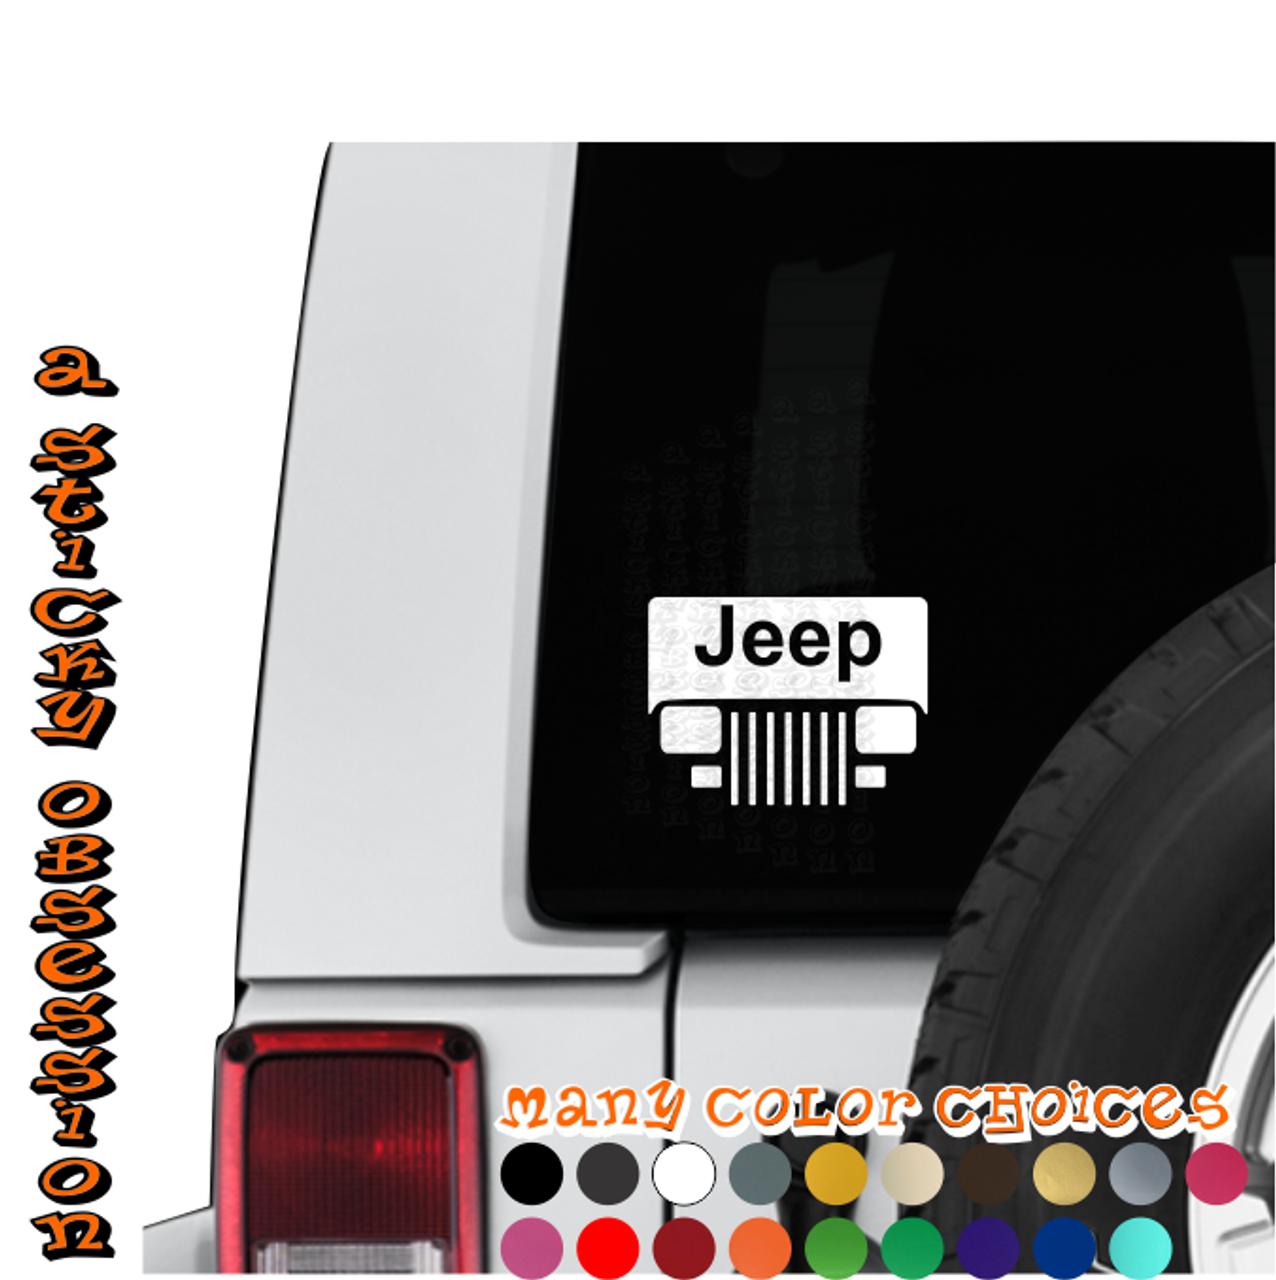 Jeep wrangler yj windshield decal on jeep